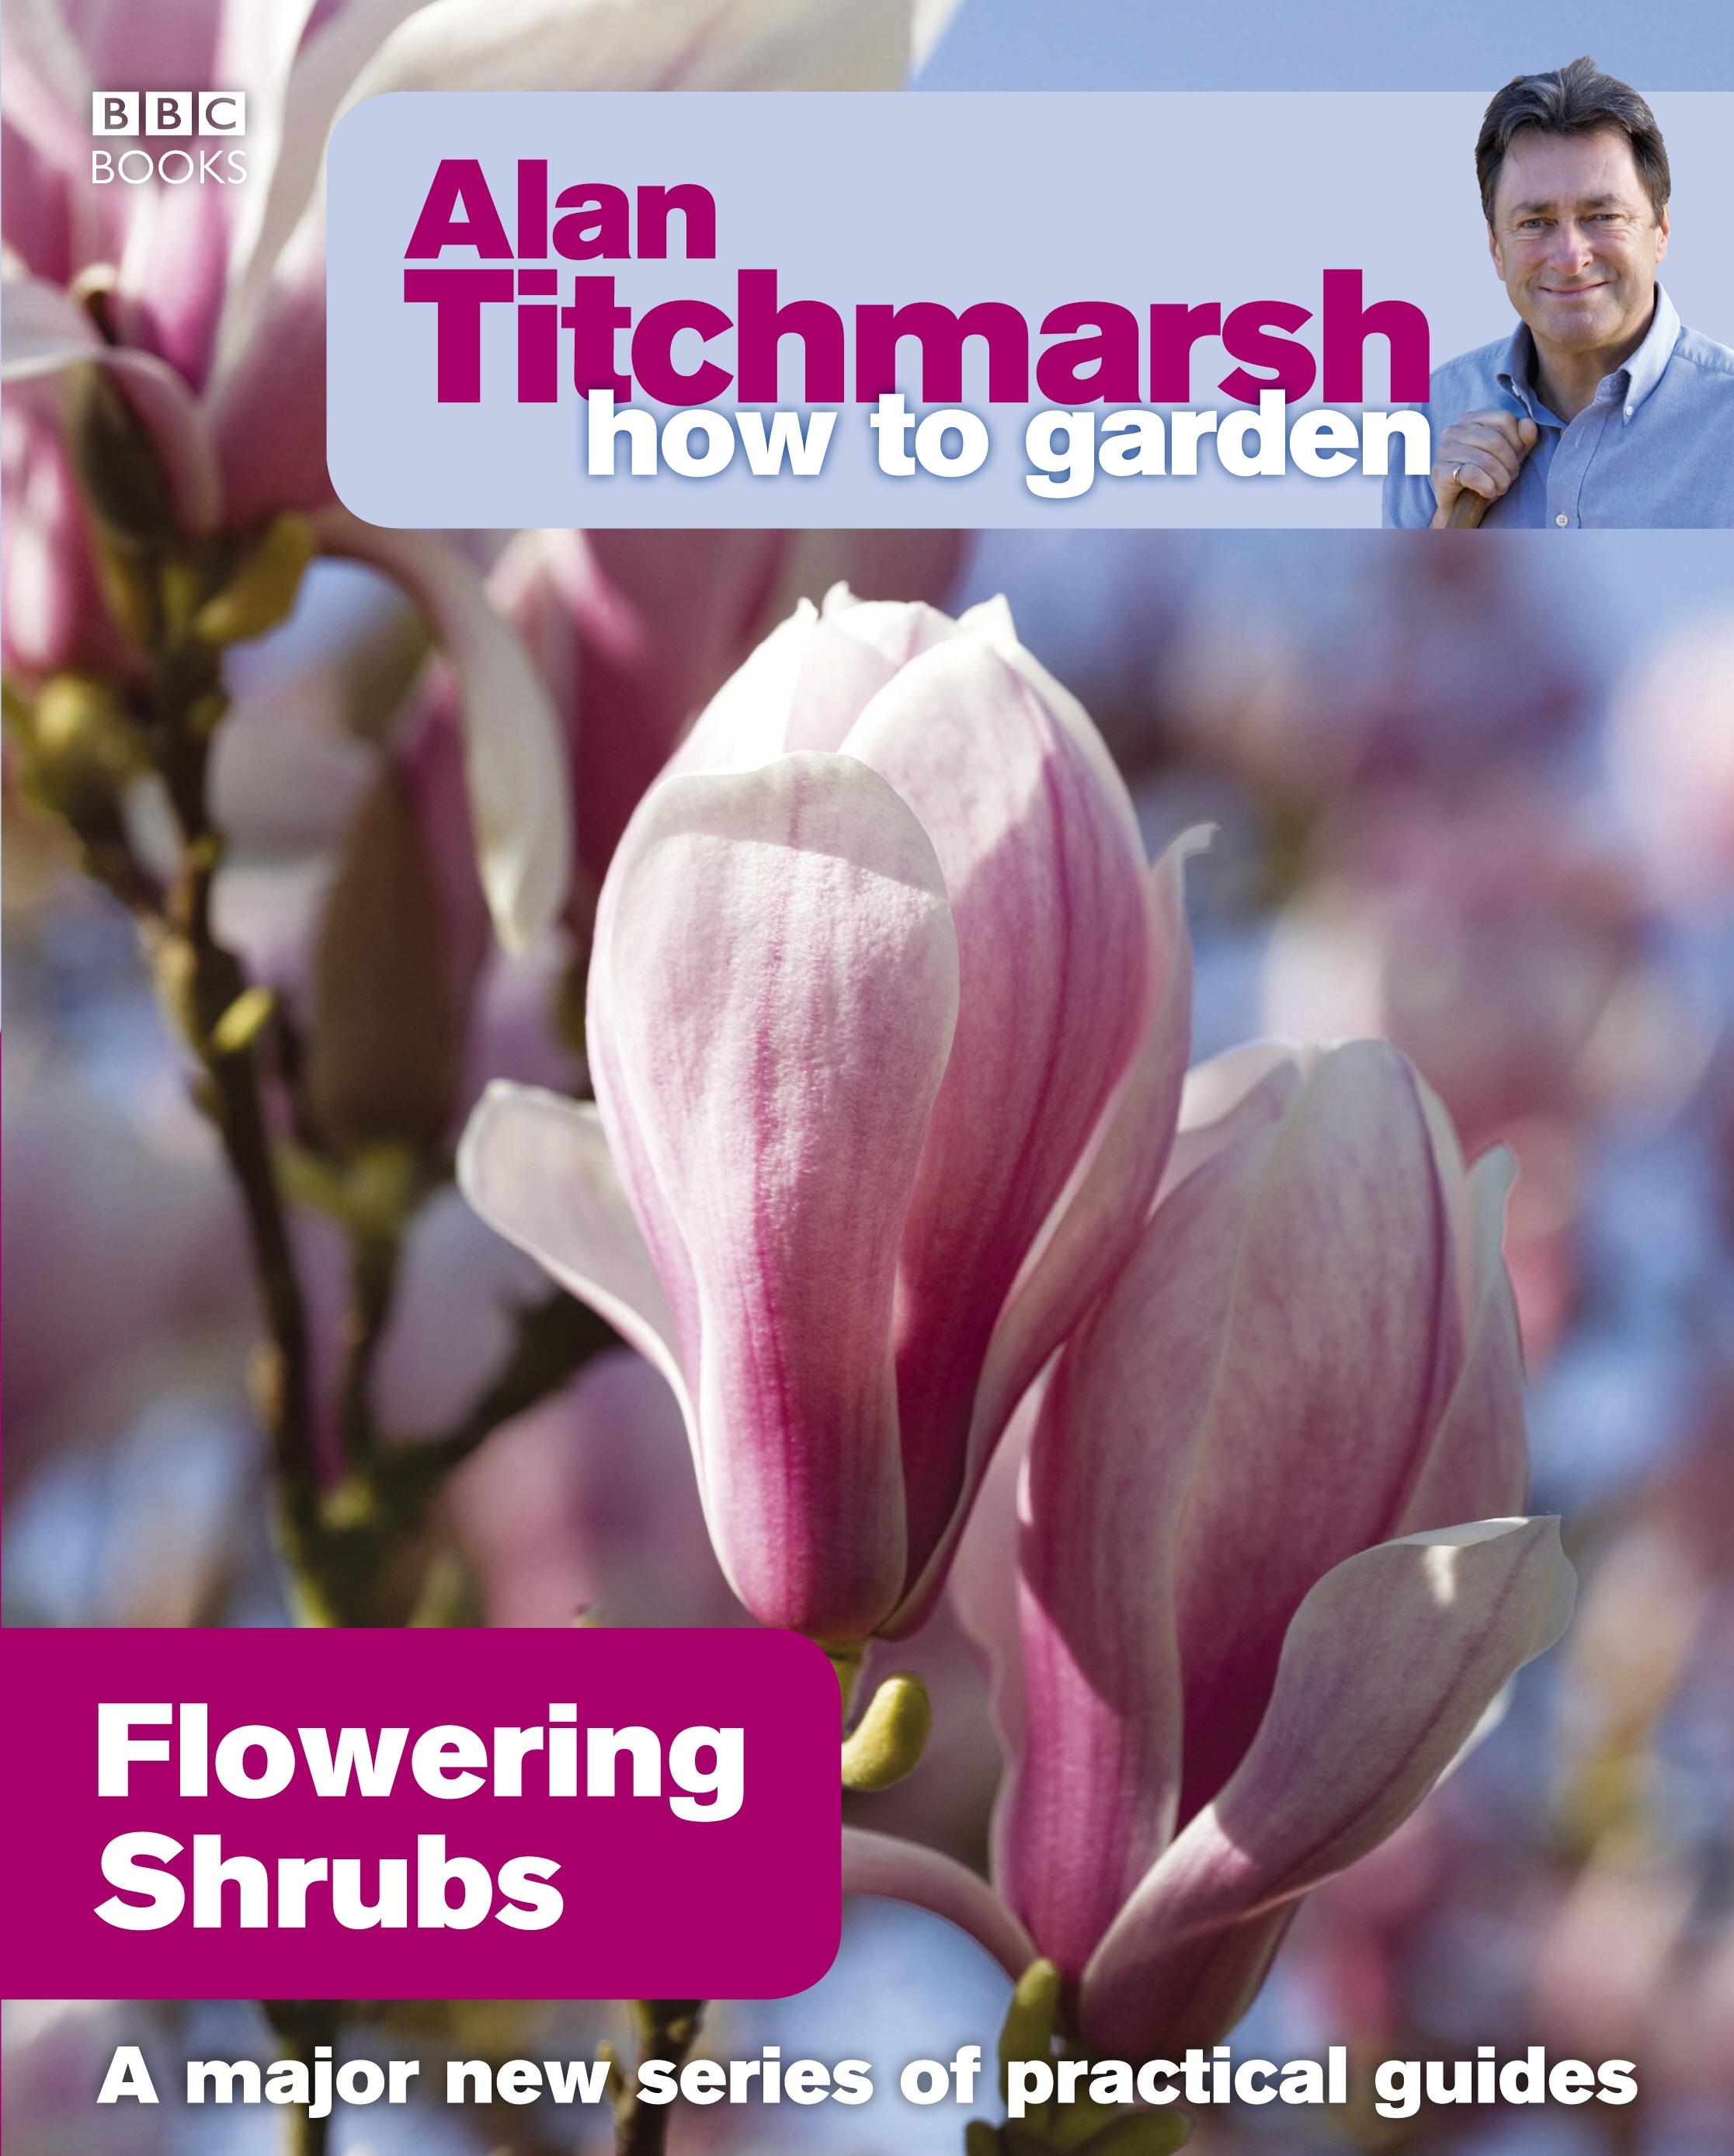 Alan Titchmarsh How to Garden Flowering Shrubs by Alan Titchmarsh